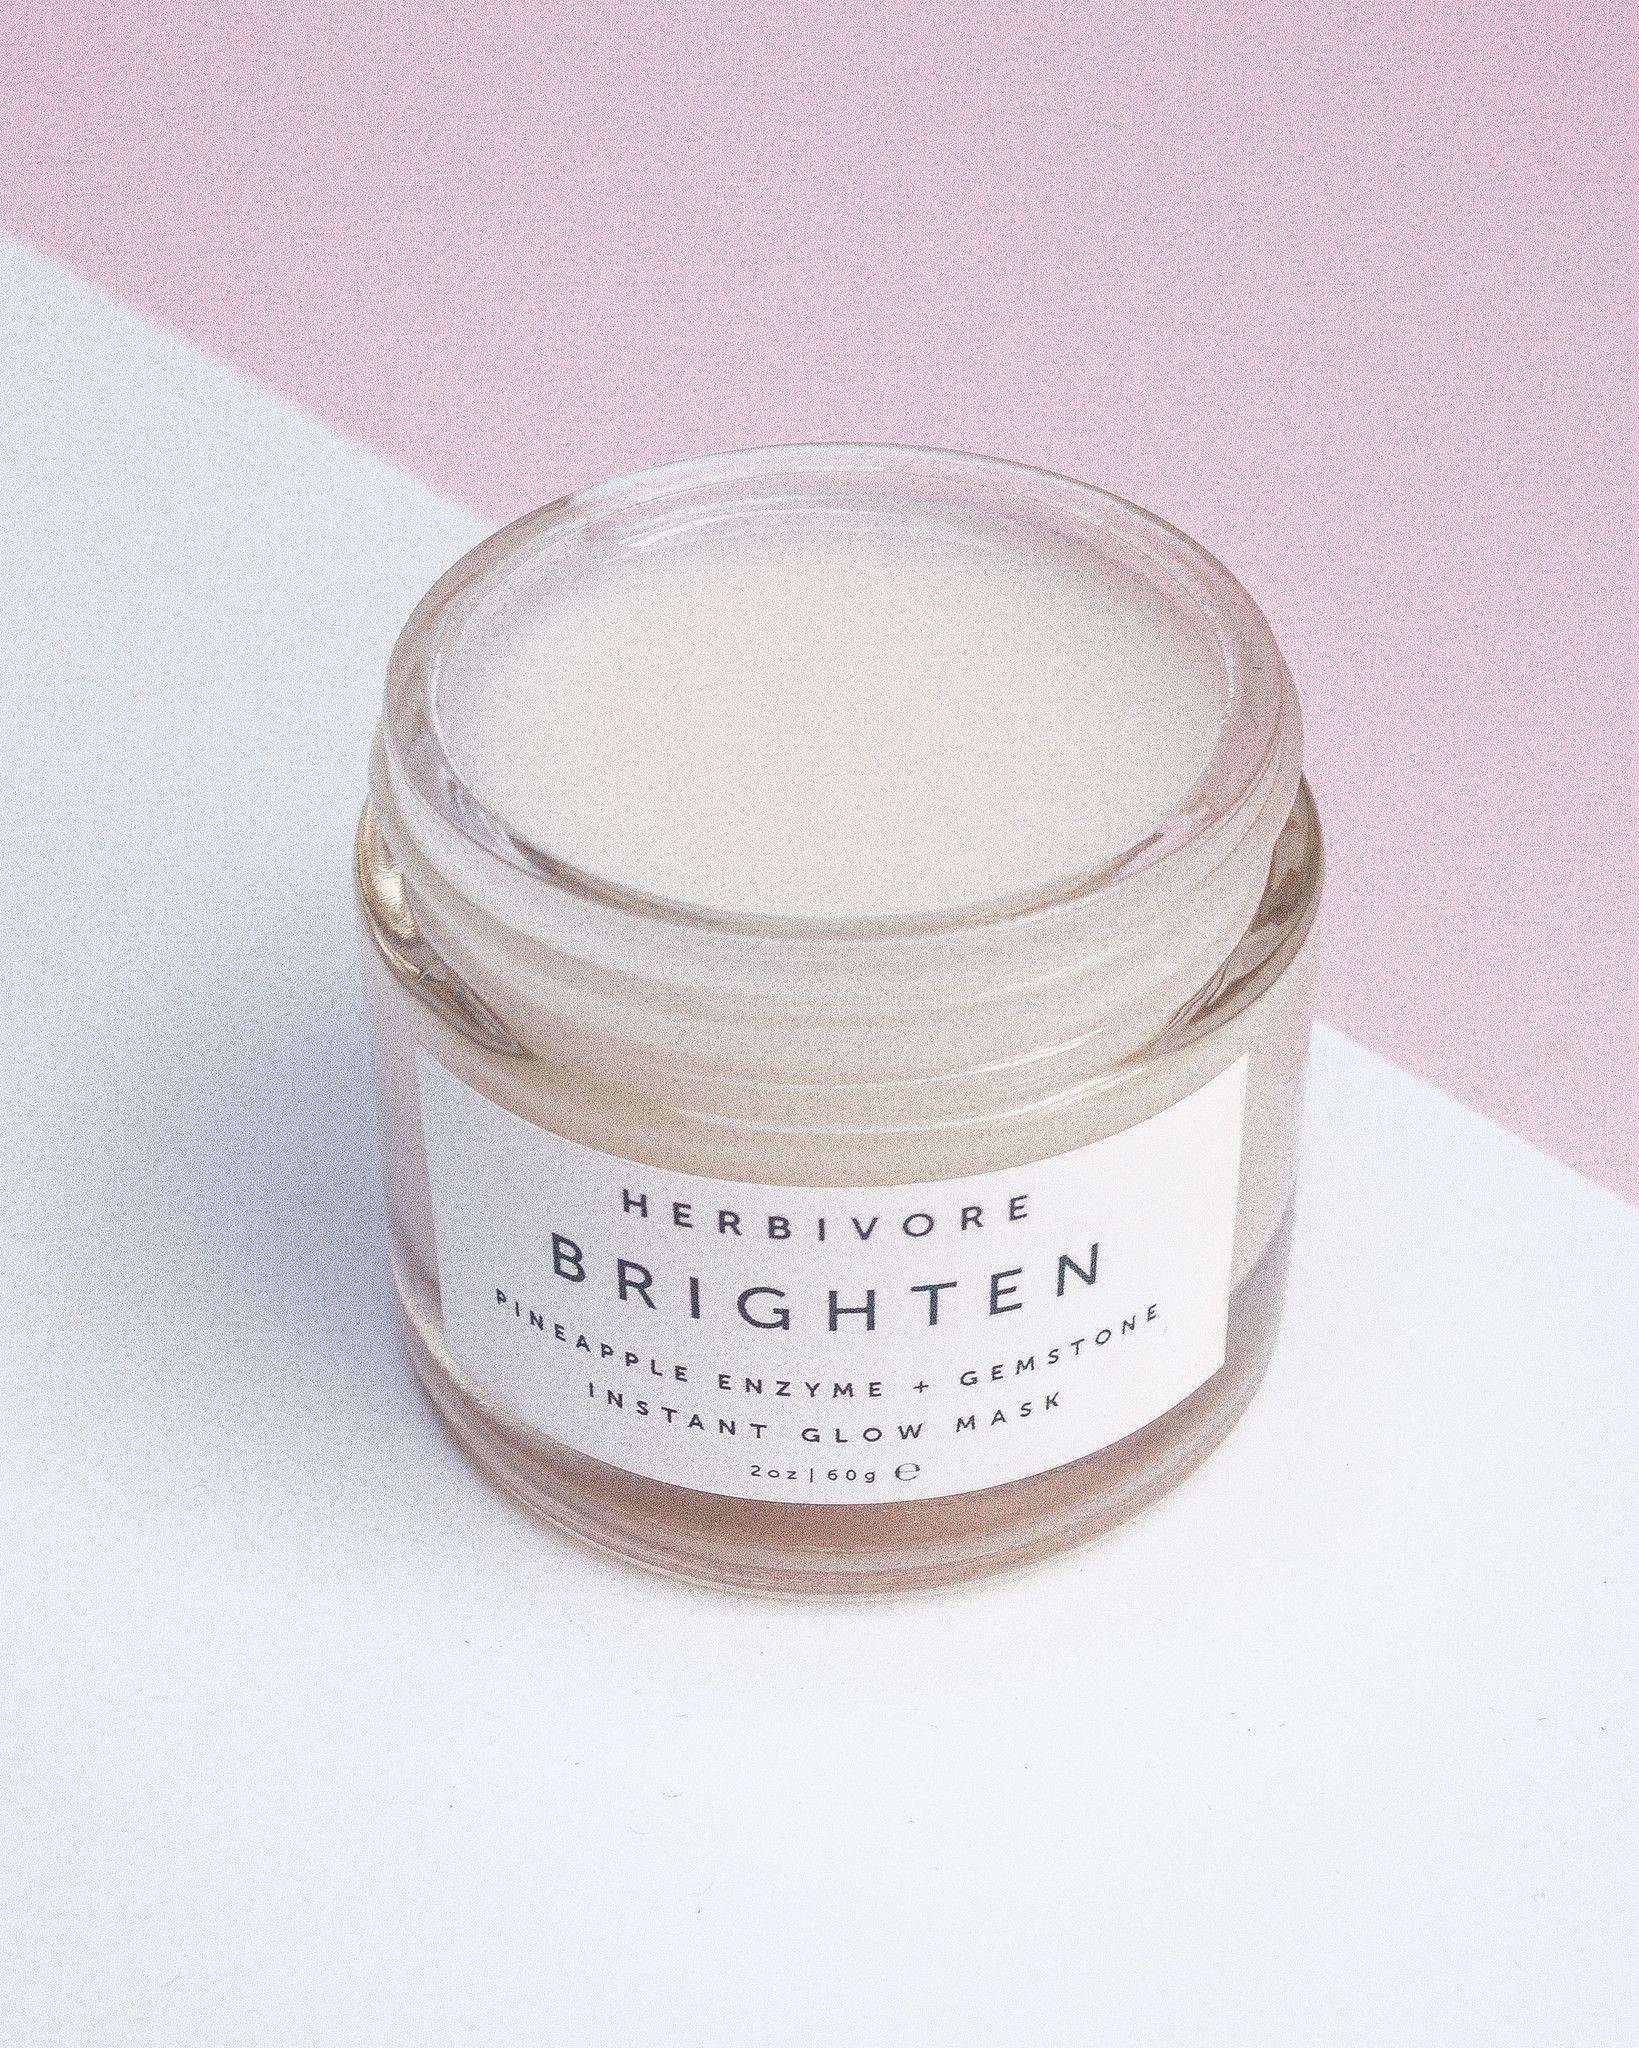 N E W - Brighten Pineapple + Gemstone Mask